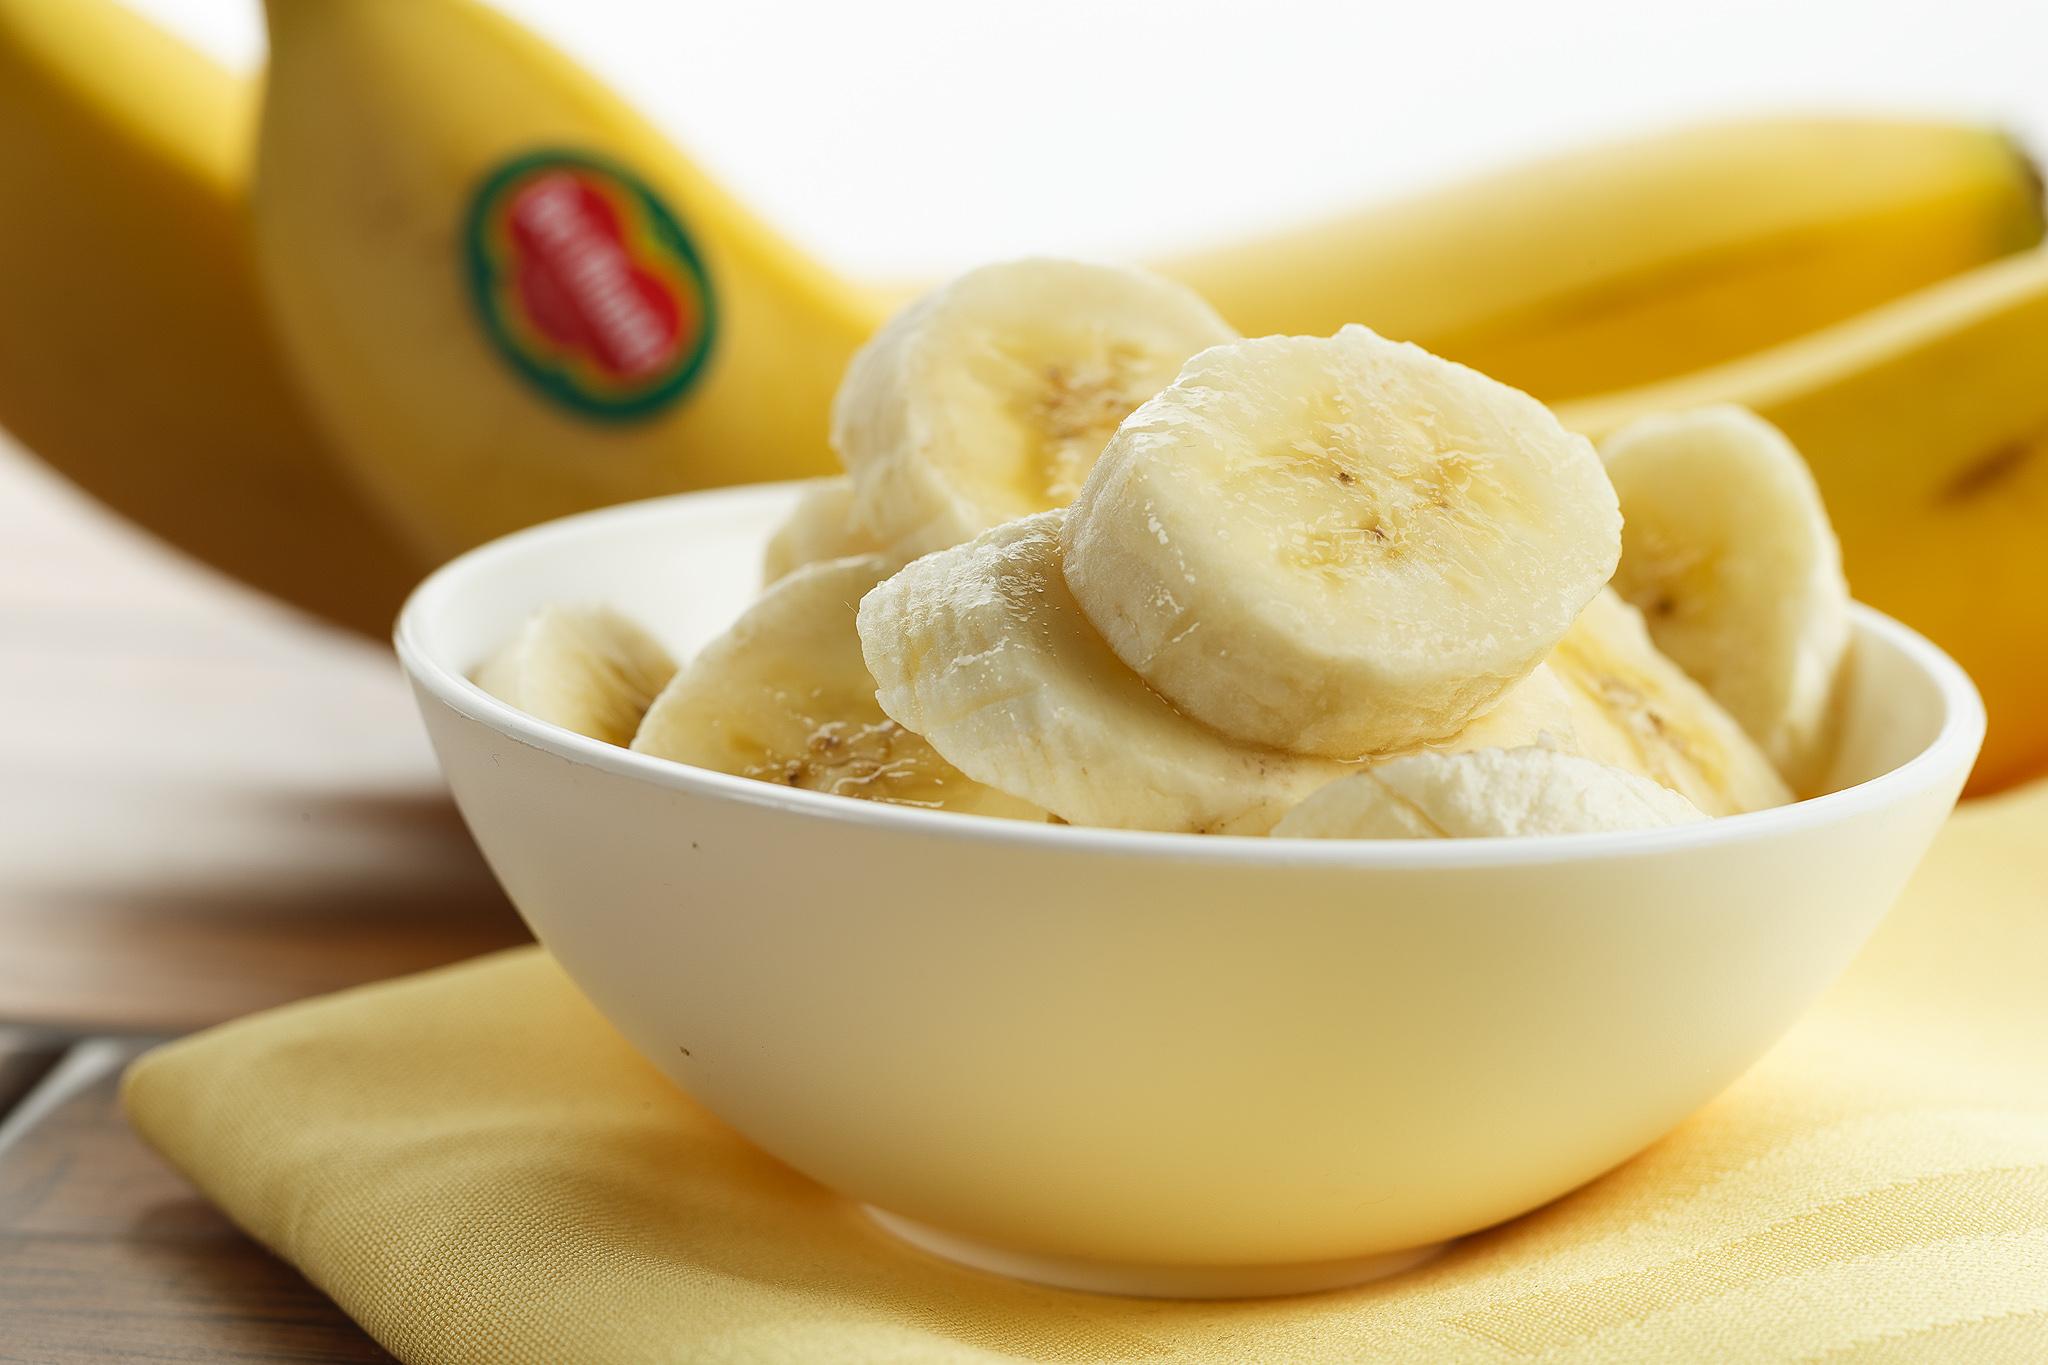 DM_HeaderDetails_Bananas_WE_03934